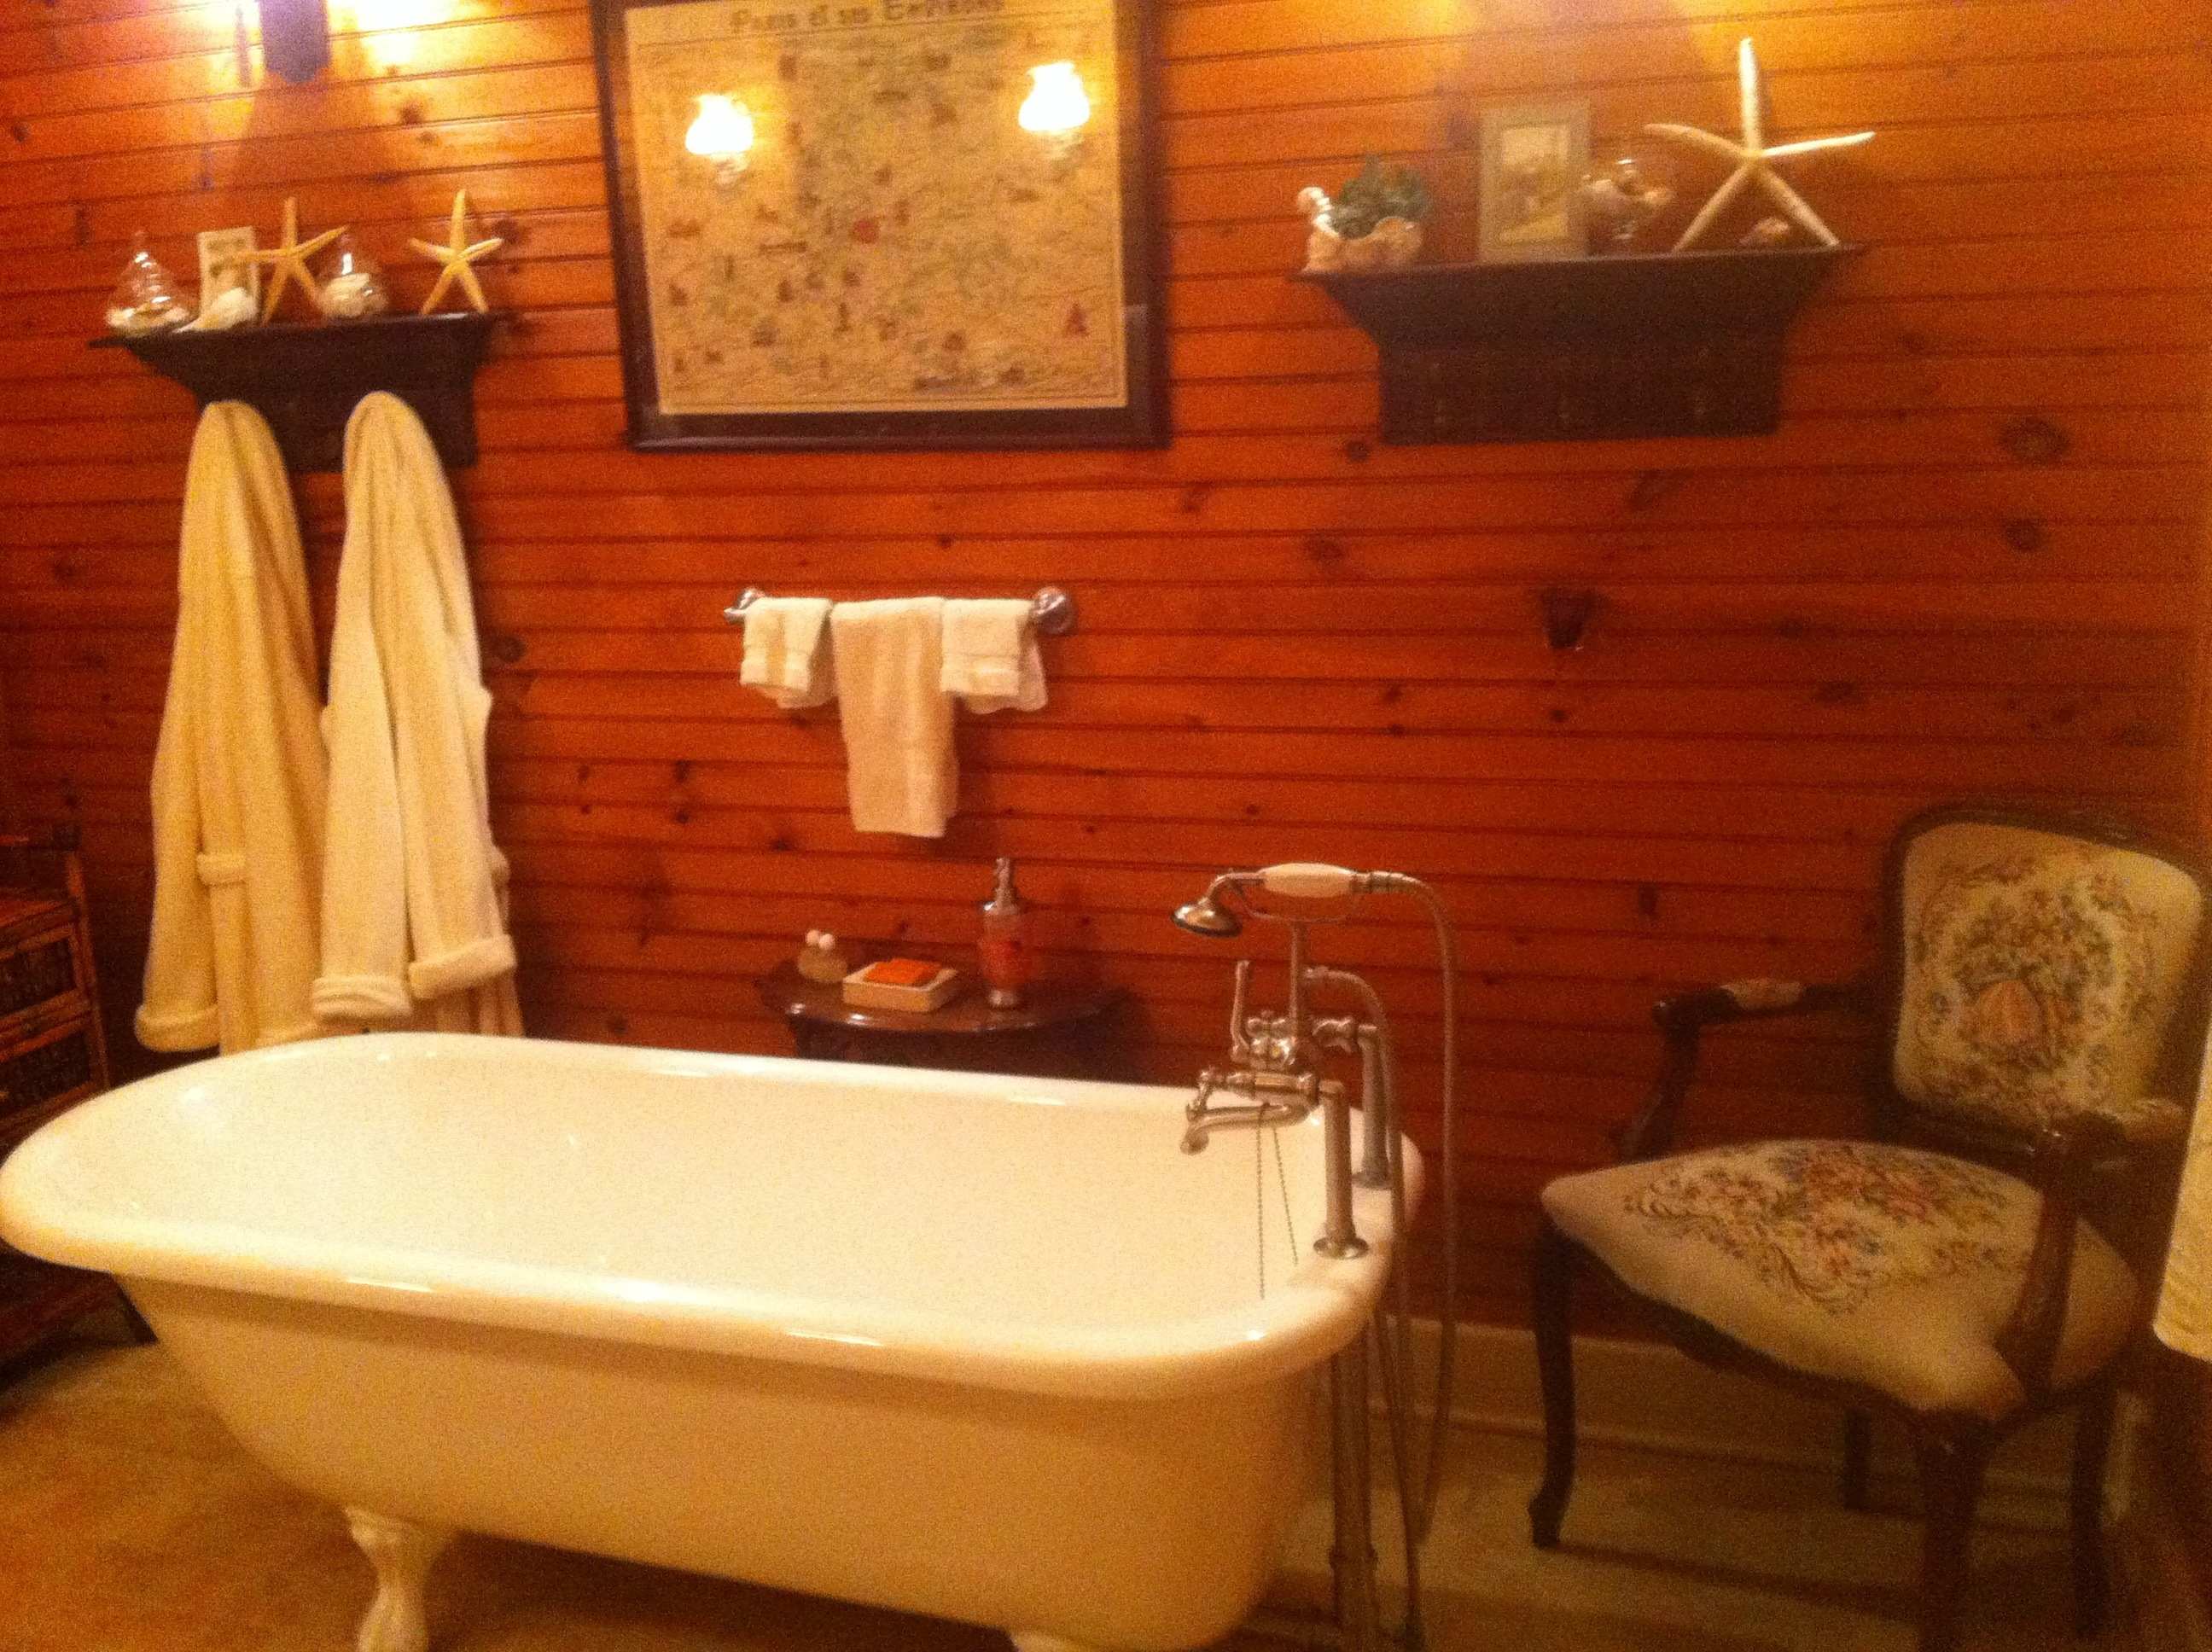 Attractive Bubble Bath Tub Elaboration - Luxurious Bathtub Ideas and ...